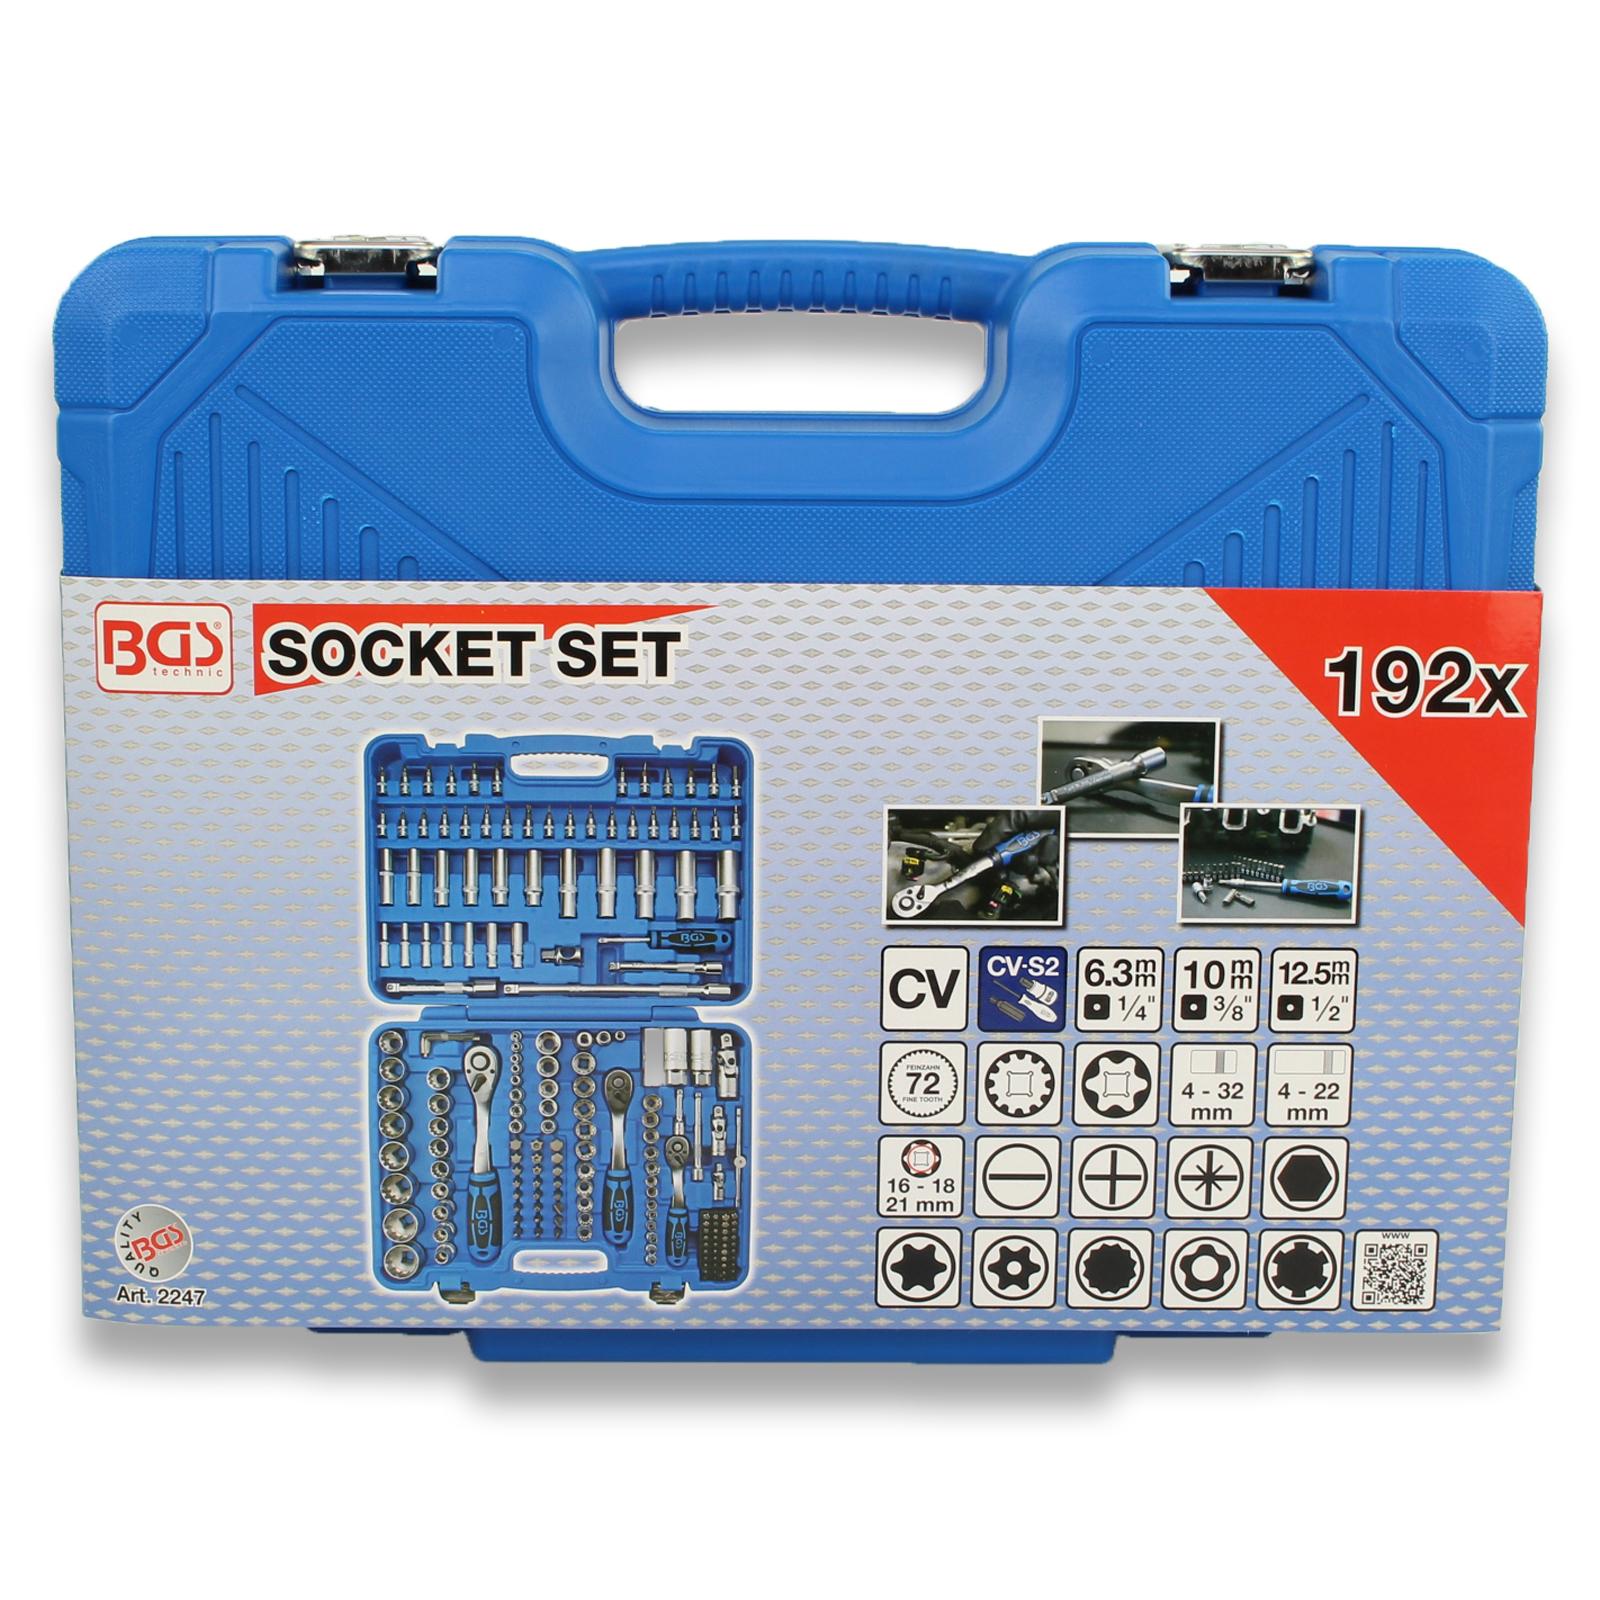 BGS 2247 Steckschlüsselsatz